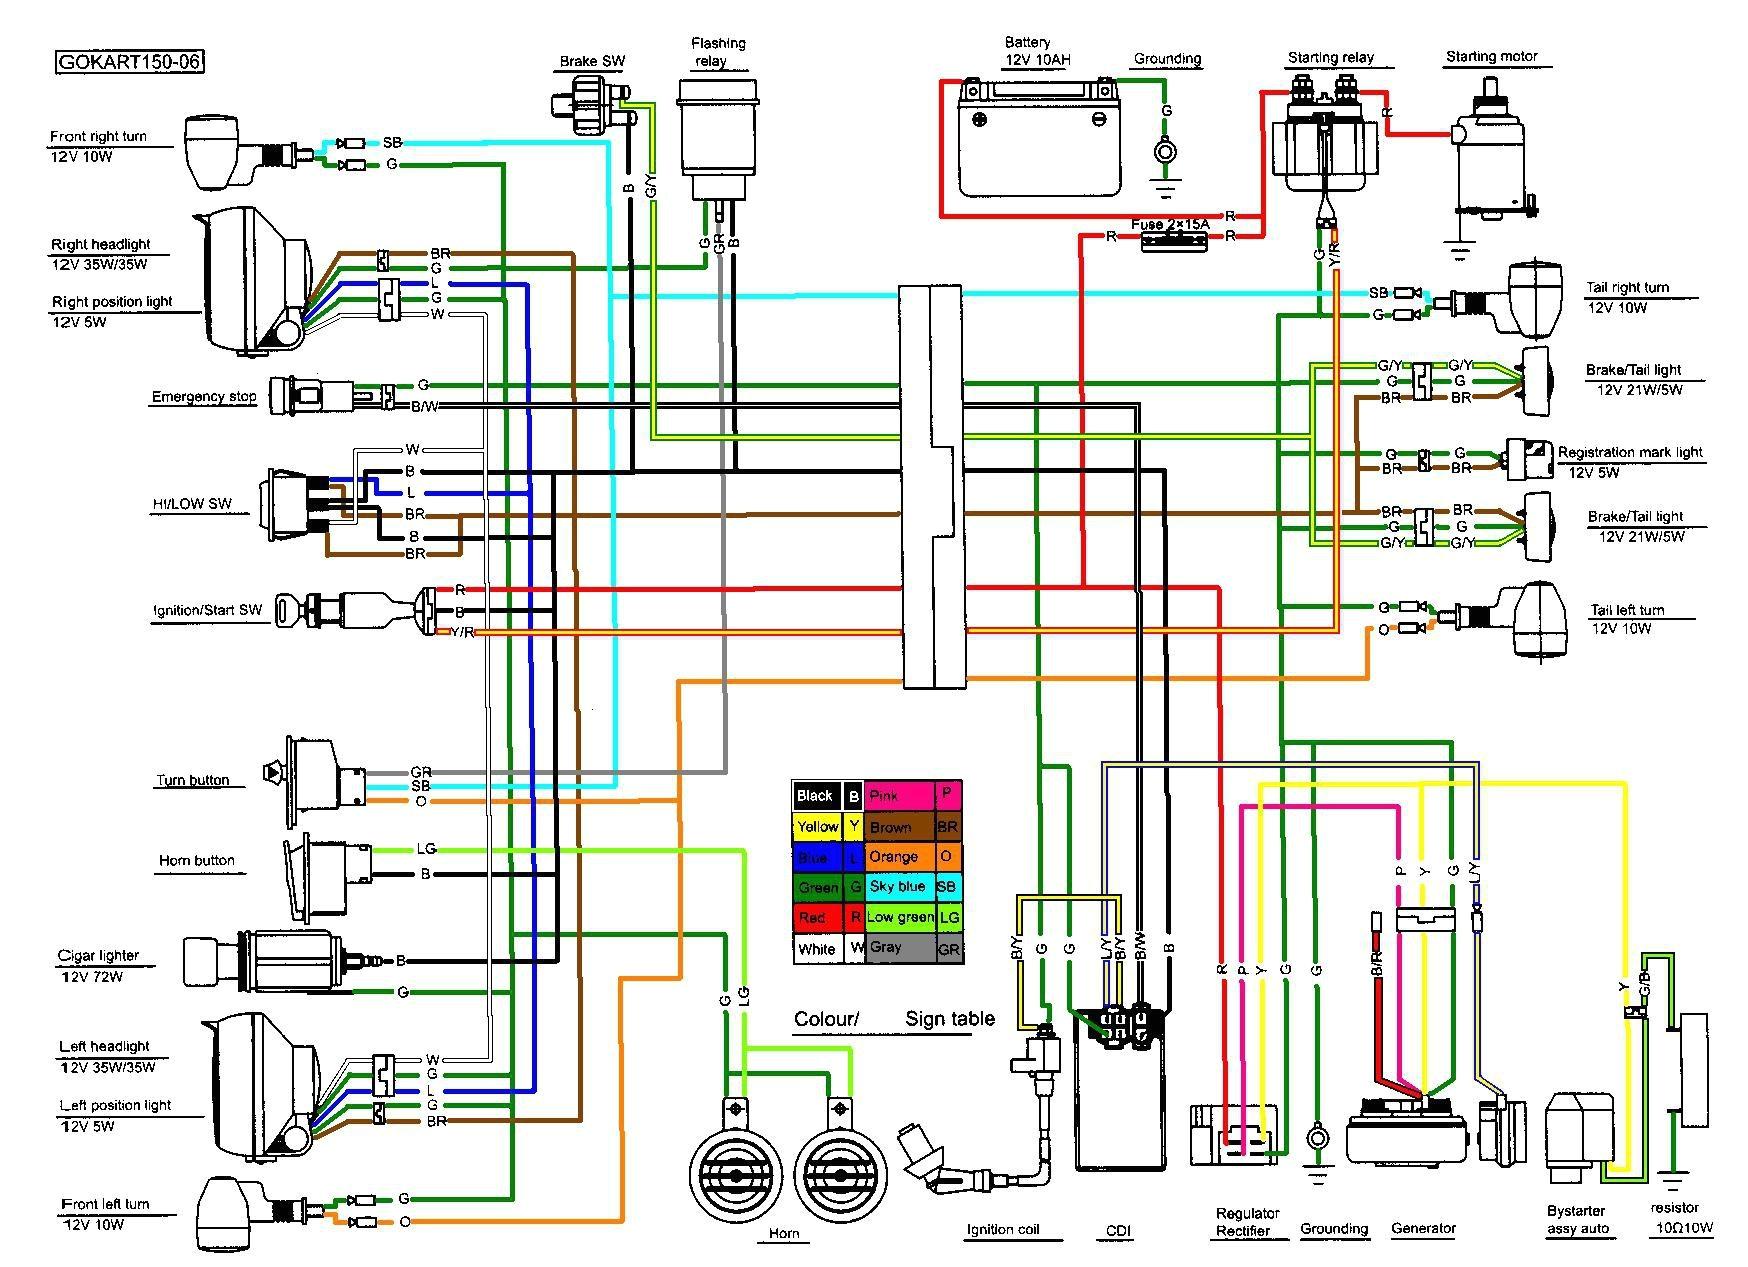 scooter wiring diagram blog wiring diagram scooter electric diagram scooter electrical diagram